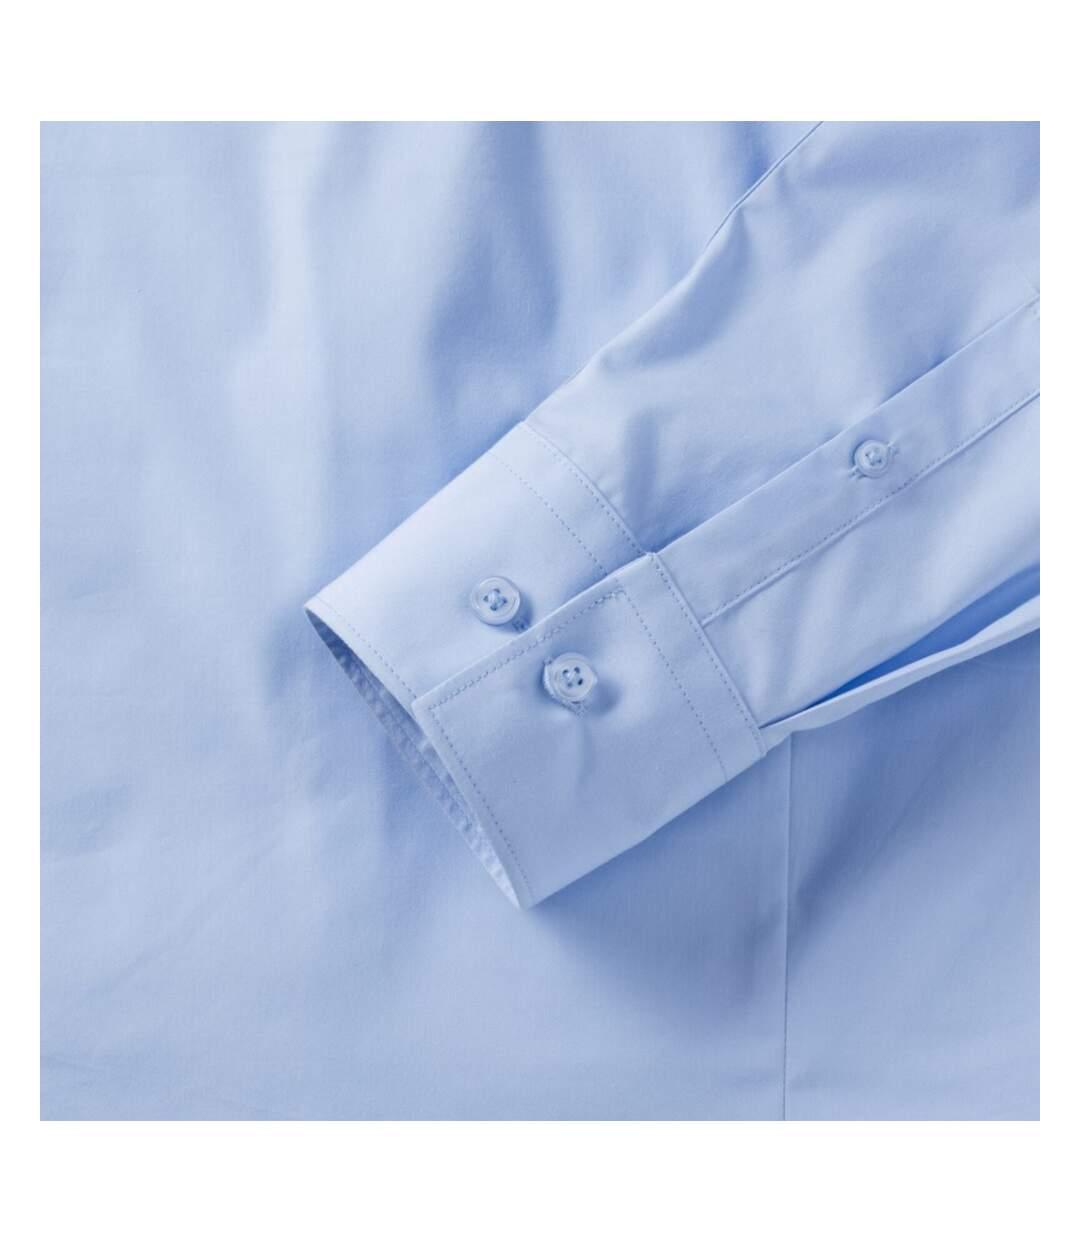 Russell Mens Stretch Moisture Management Work Shirt (Bright Sky) - UTBC2737